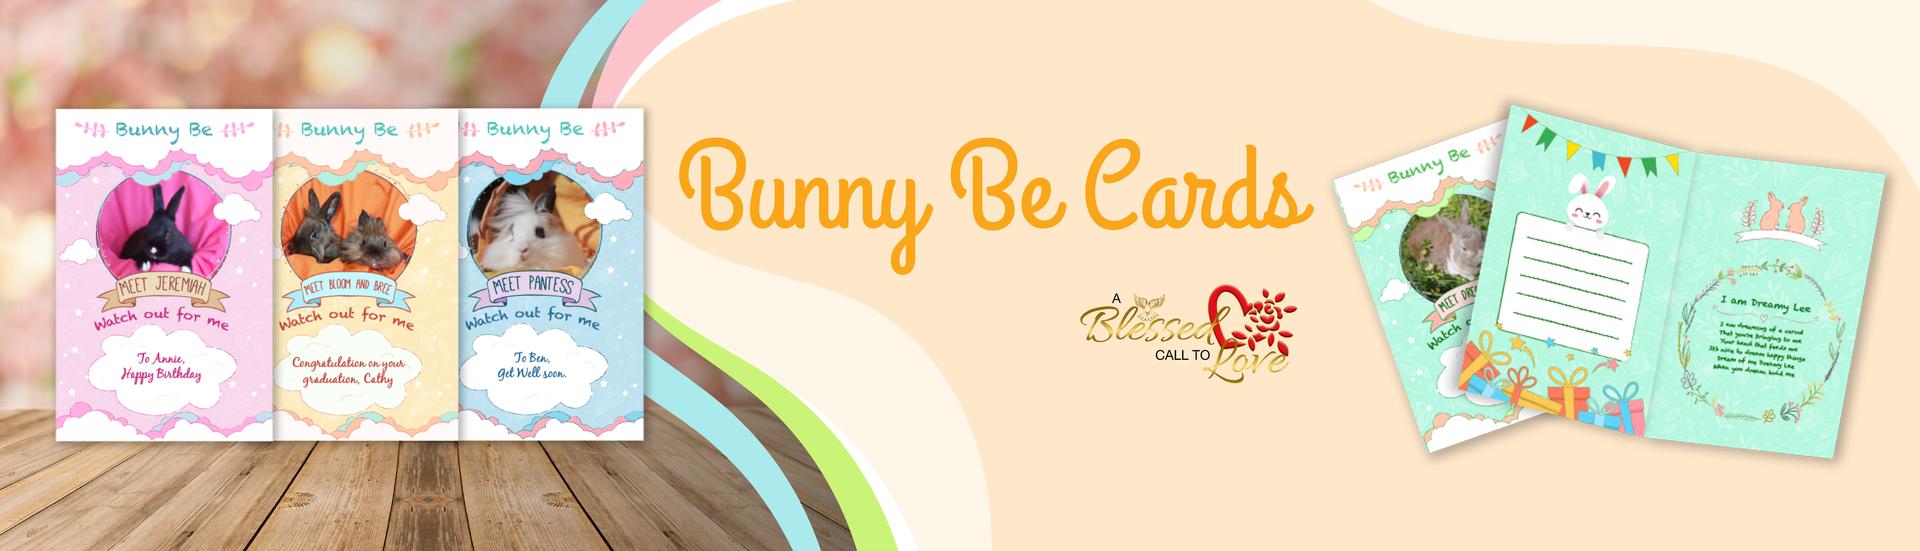 web-banner_bunny-be-card-v2.png